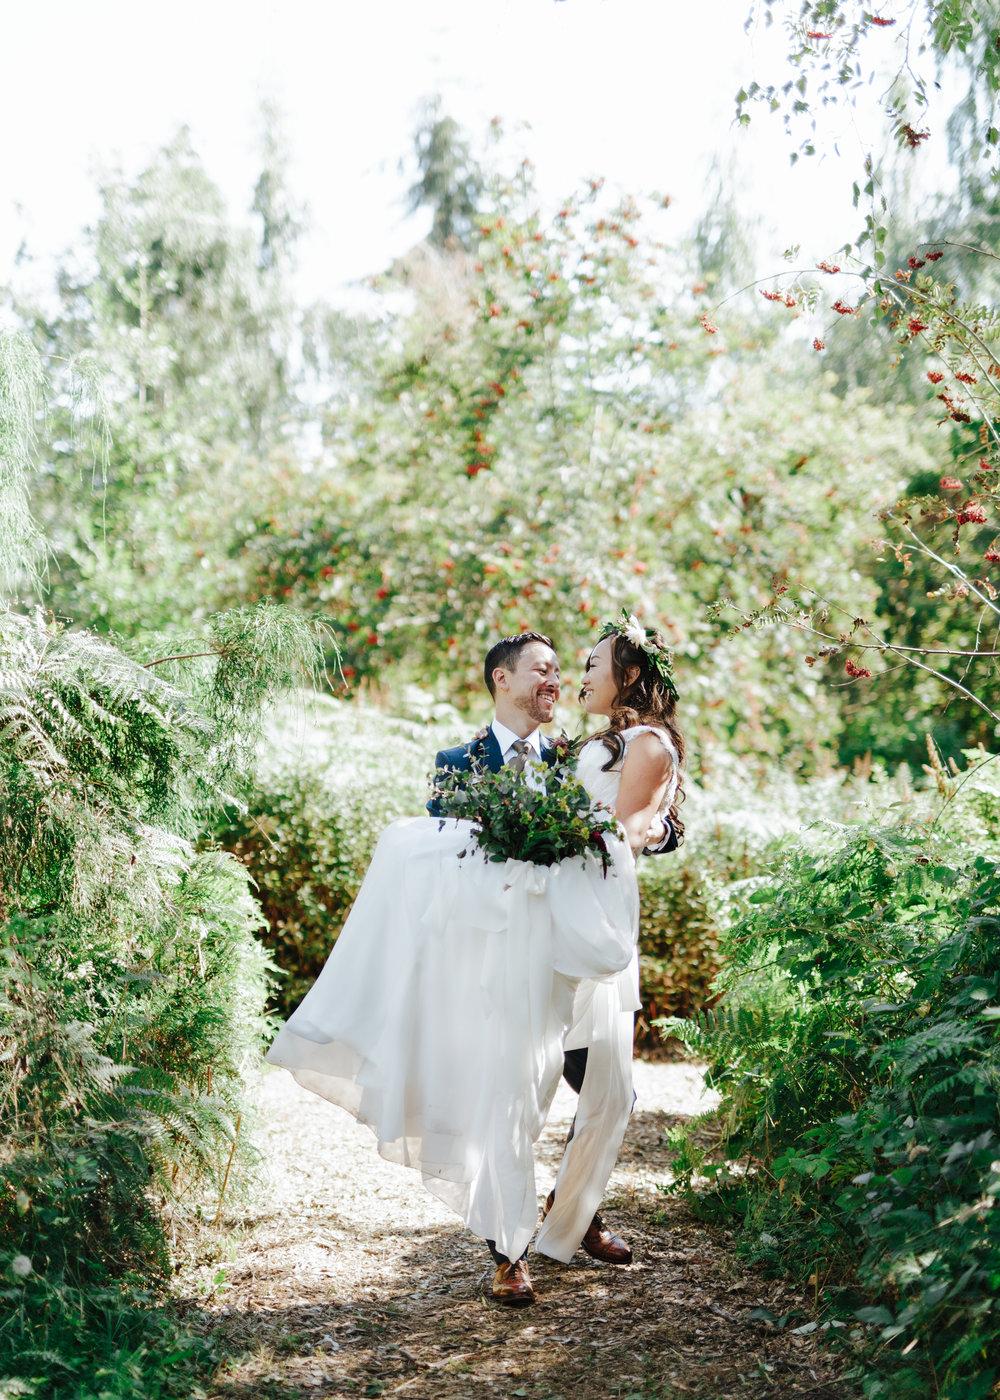 herafilms_wedding_jessica_kyle_hera_selects-26.jpg